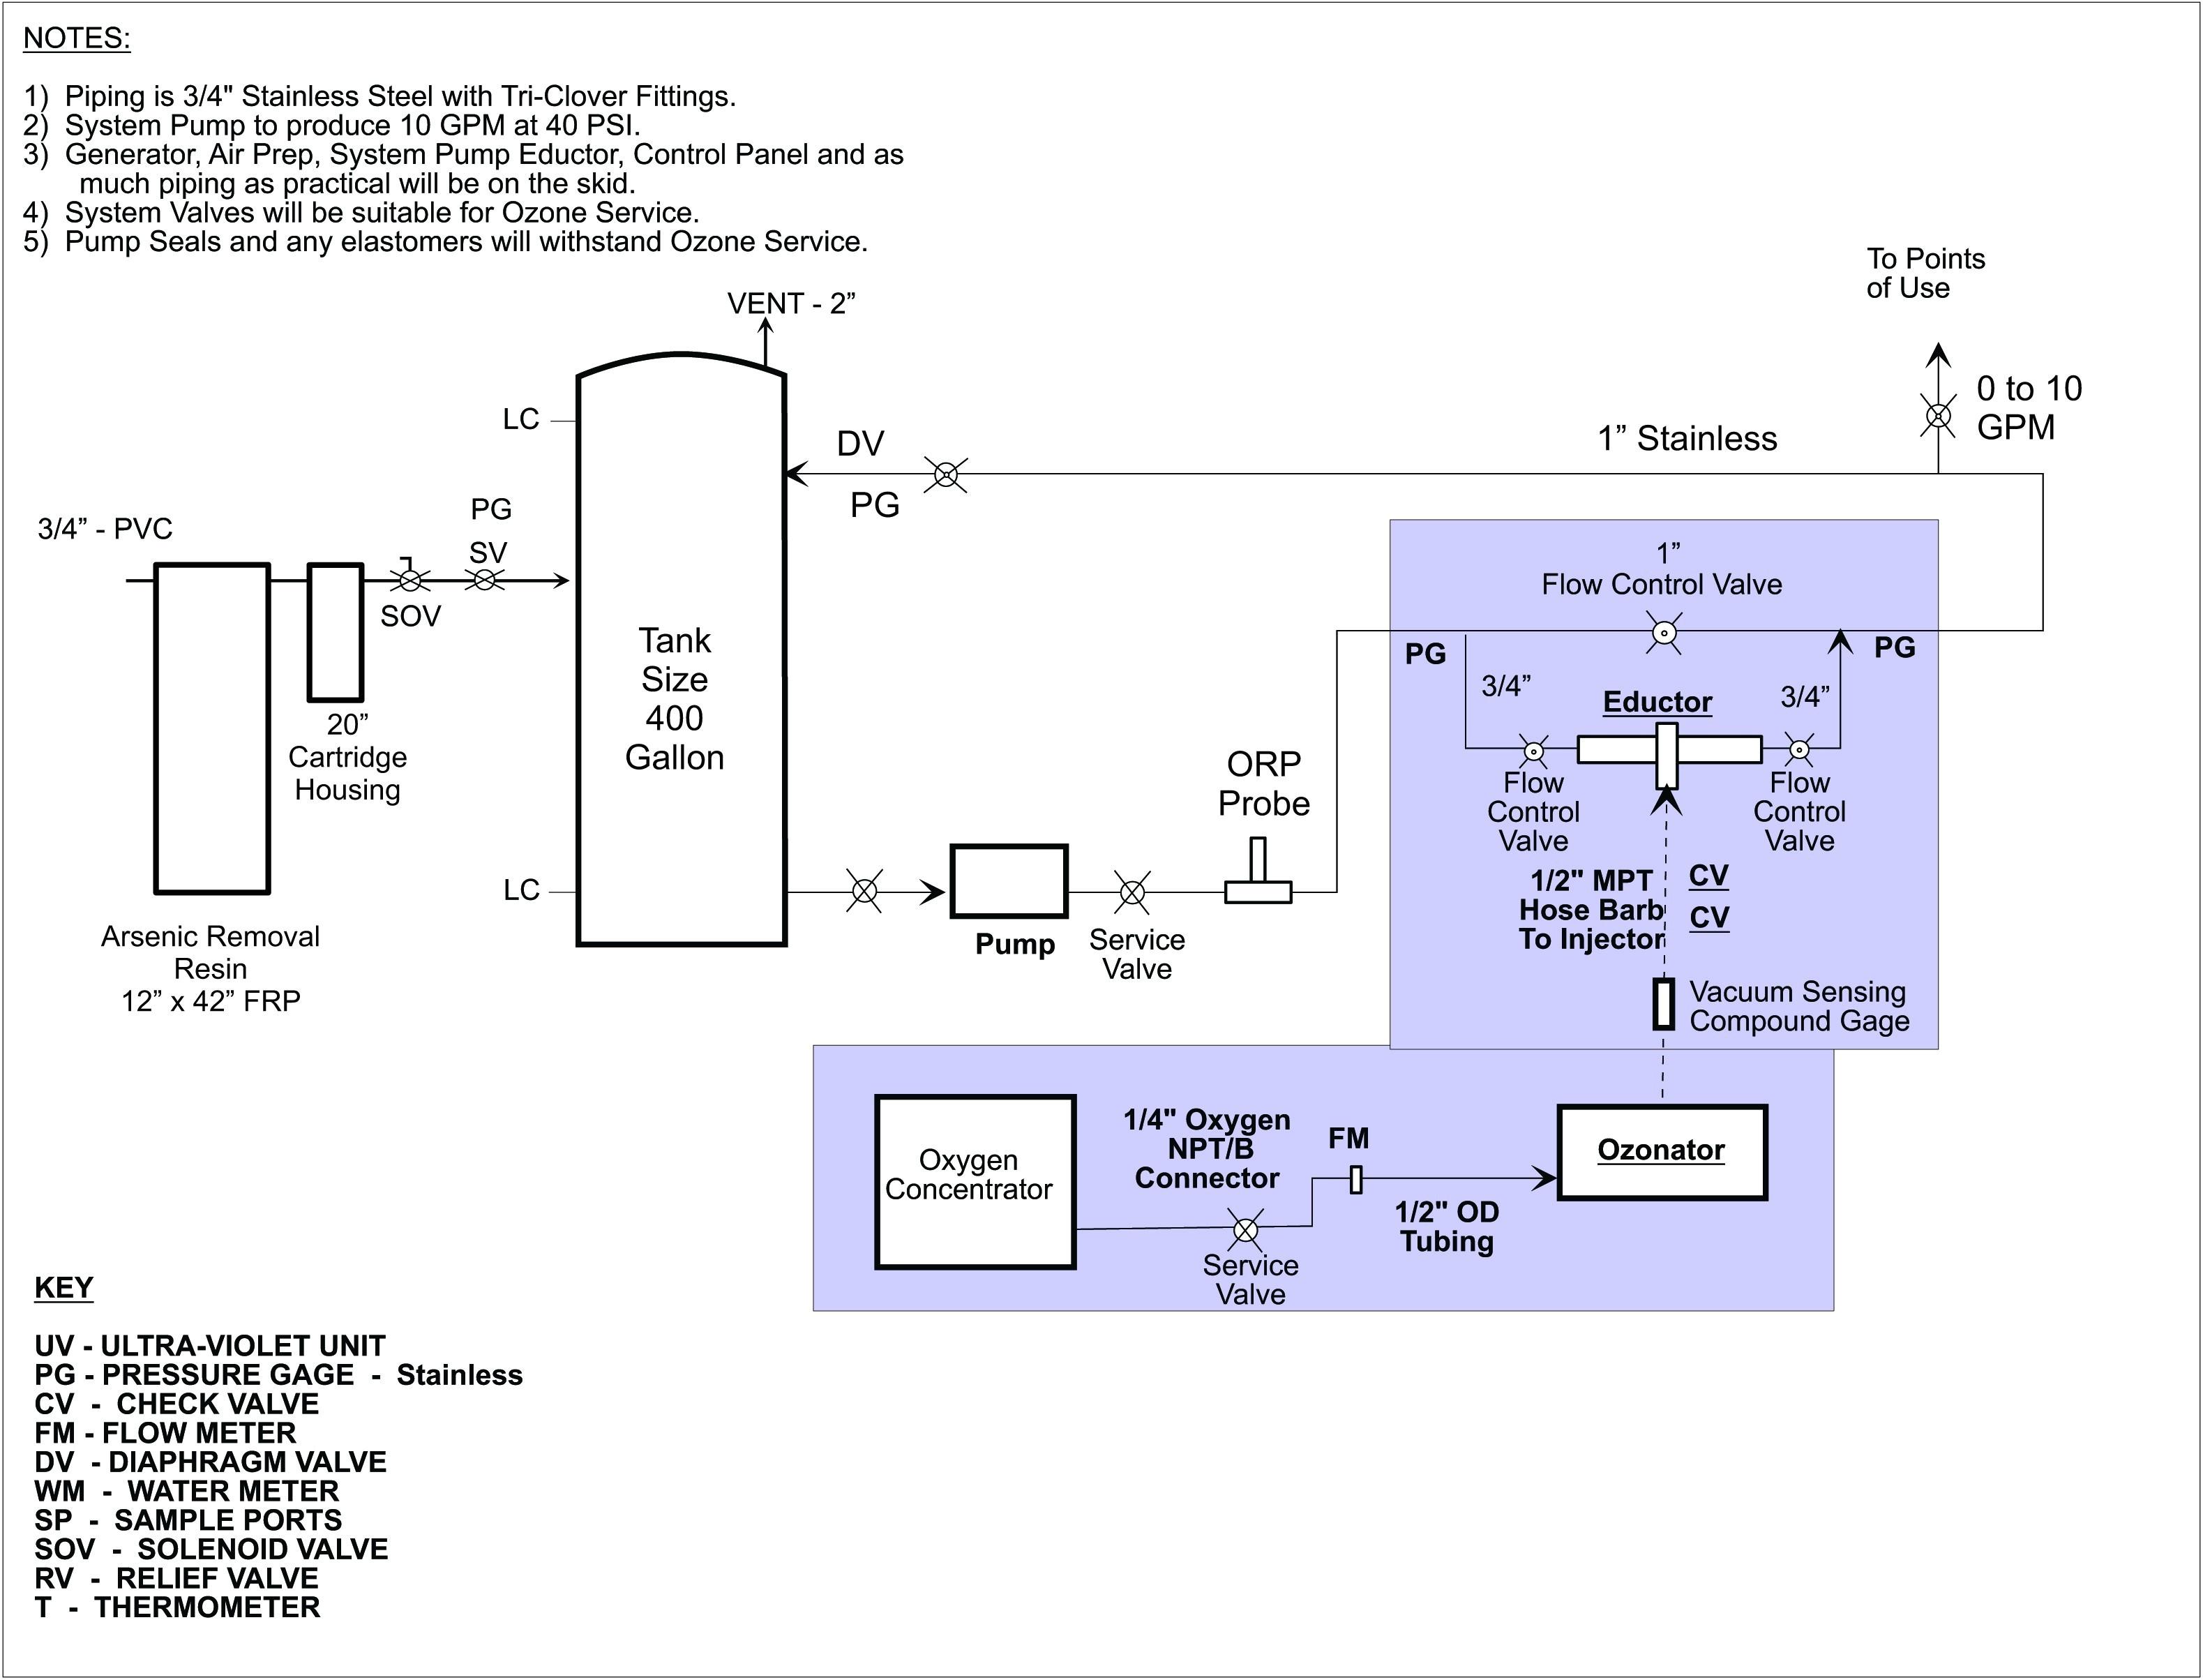 generator electricalequipmentcircuit circuit diagram seekic wiring servodrive electricalequipmentcircuit circuit diagram seekic